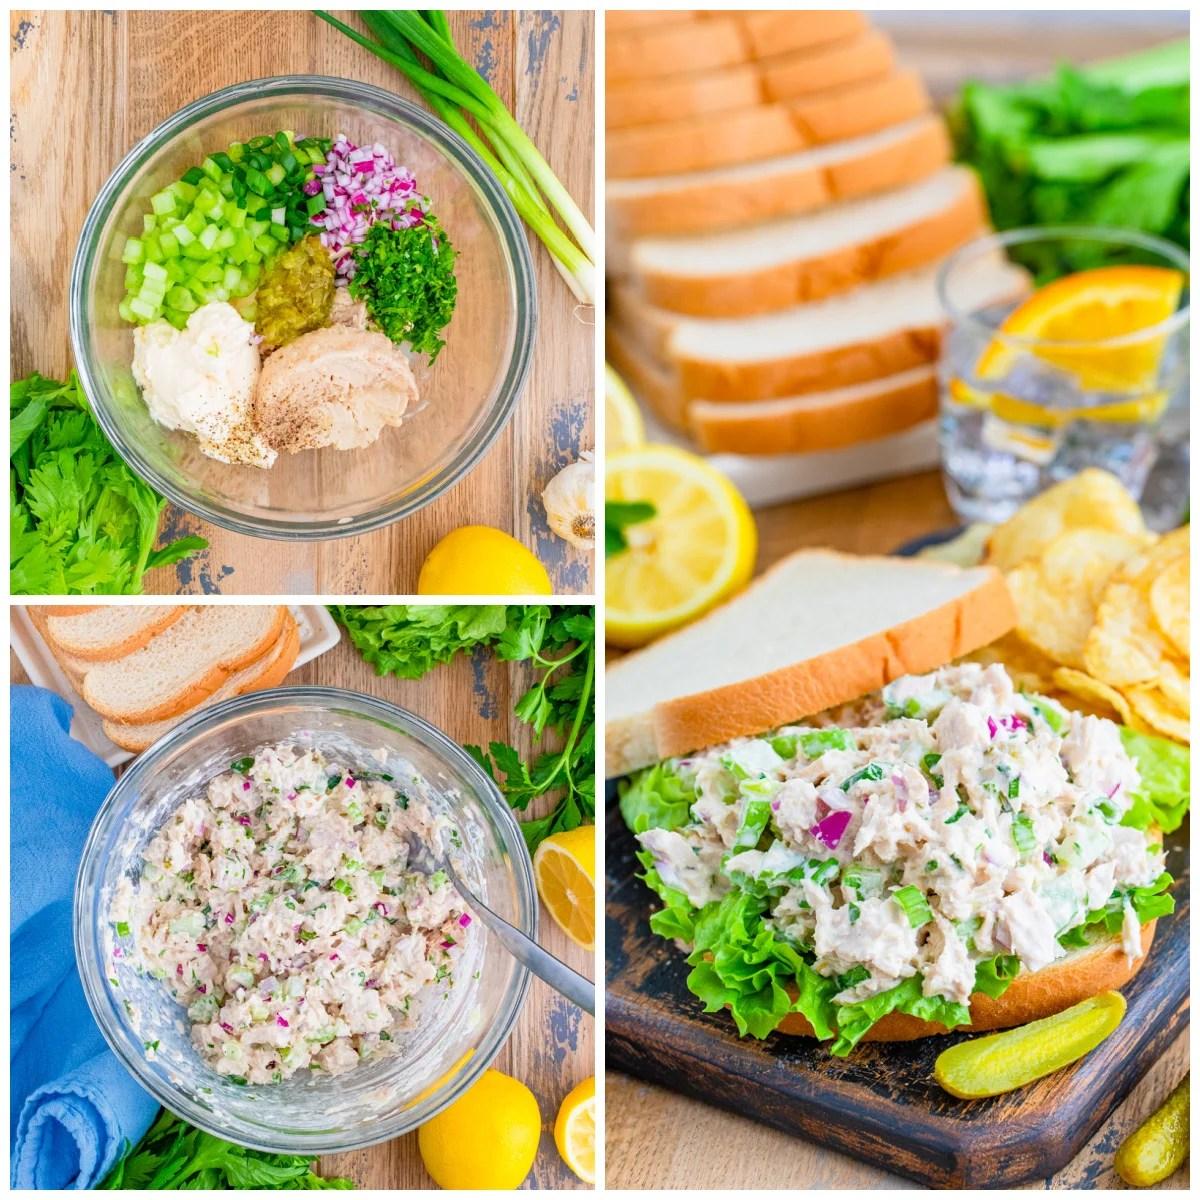 Step by step photos on how to make a Tuna Salad Sandwich